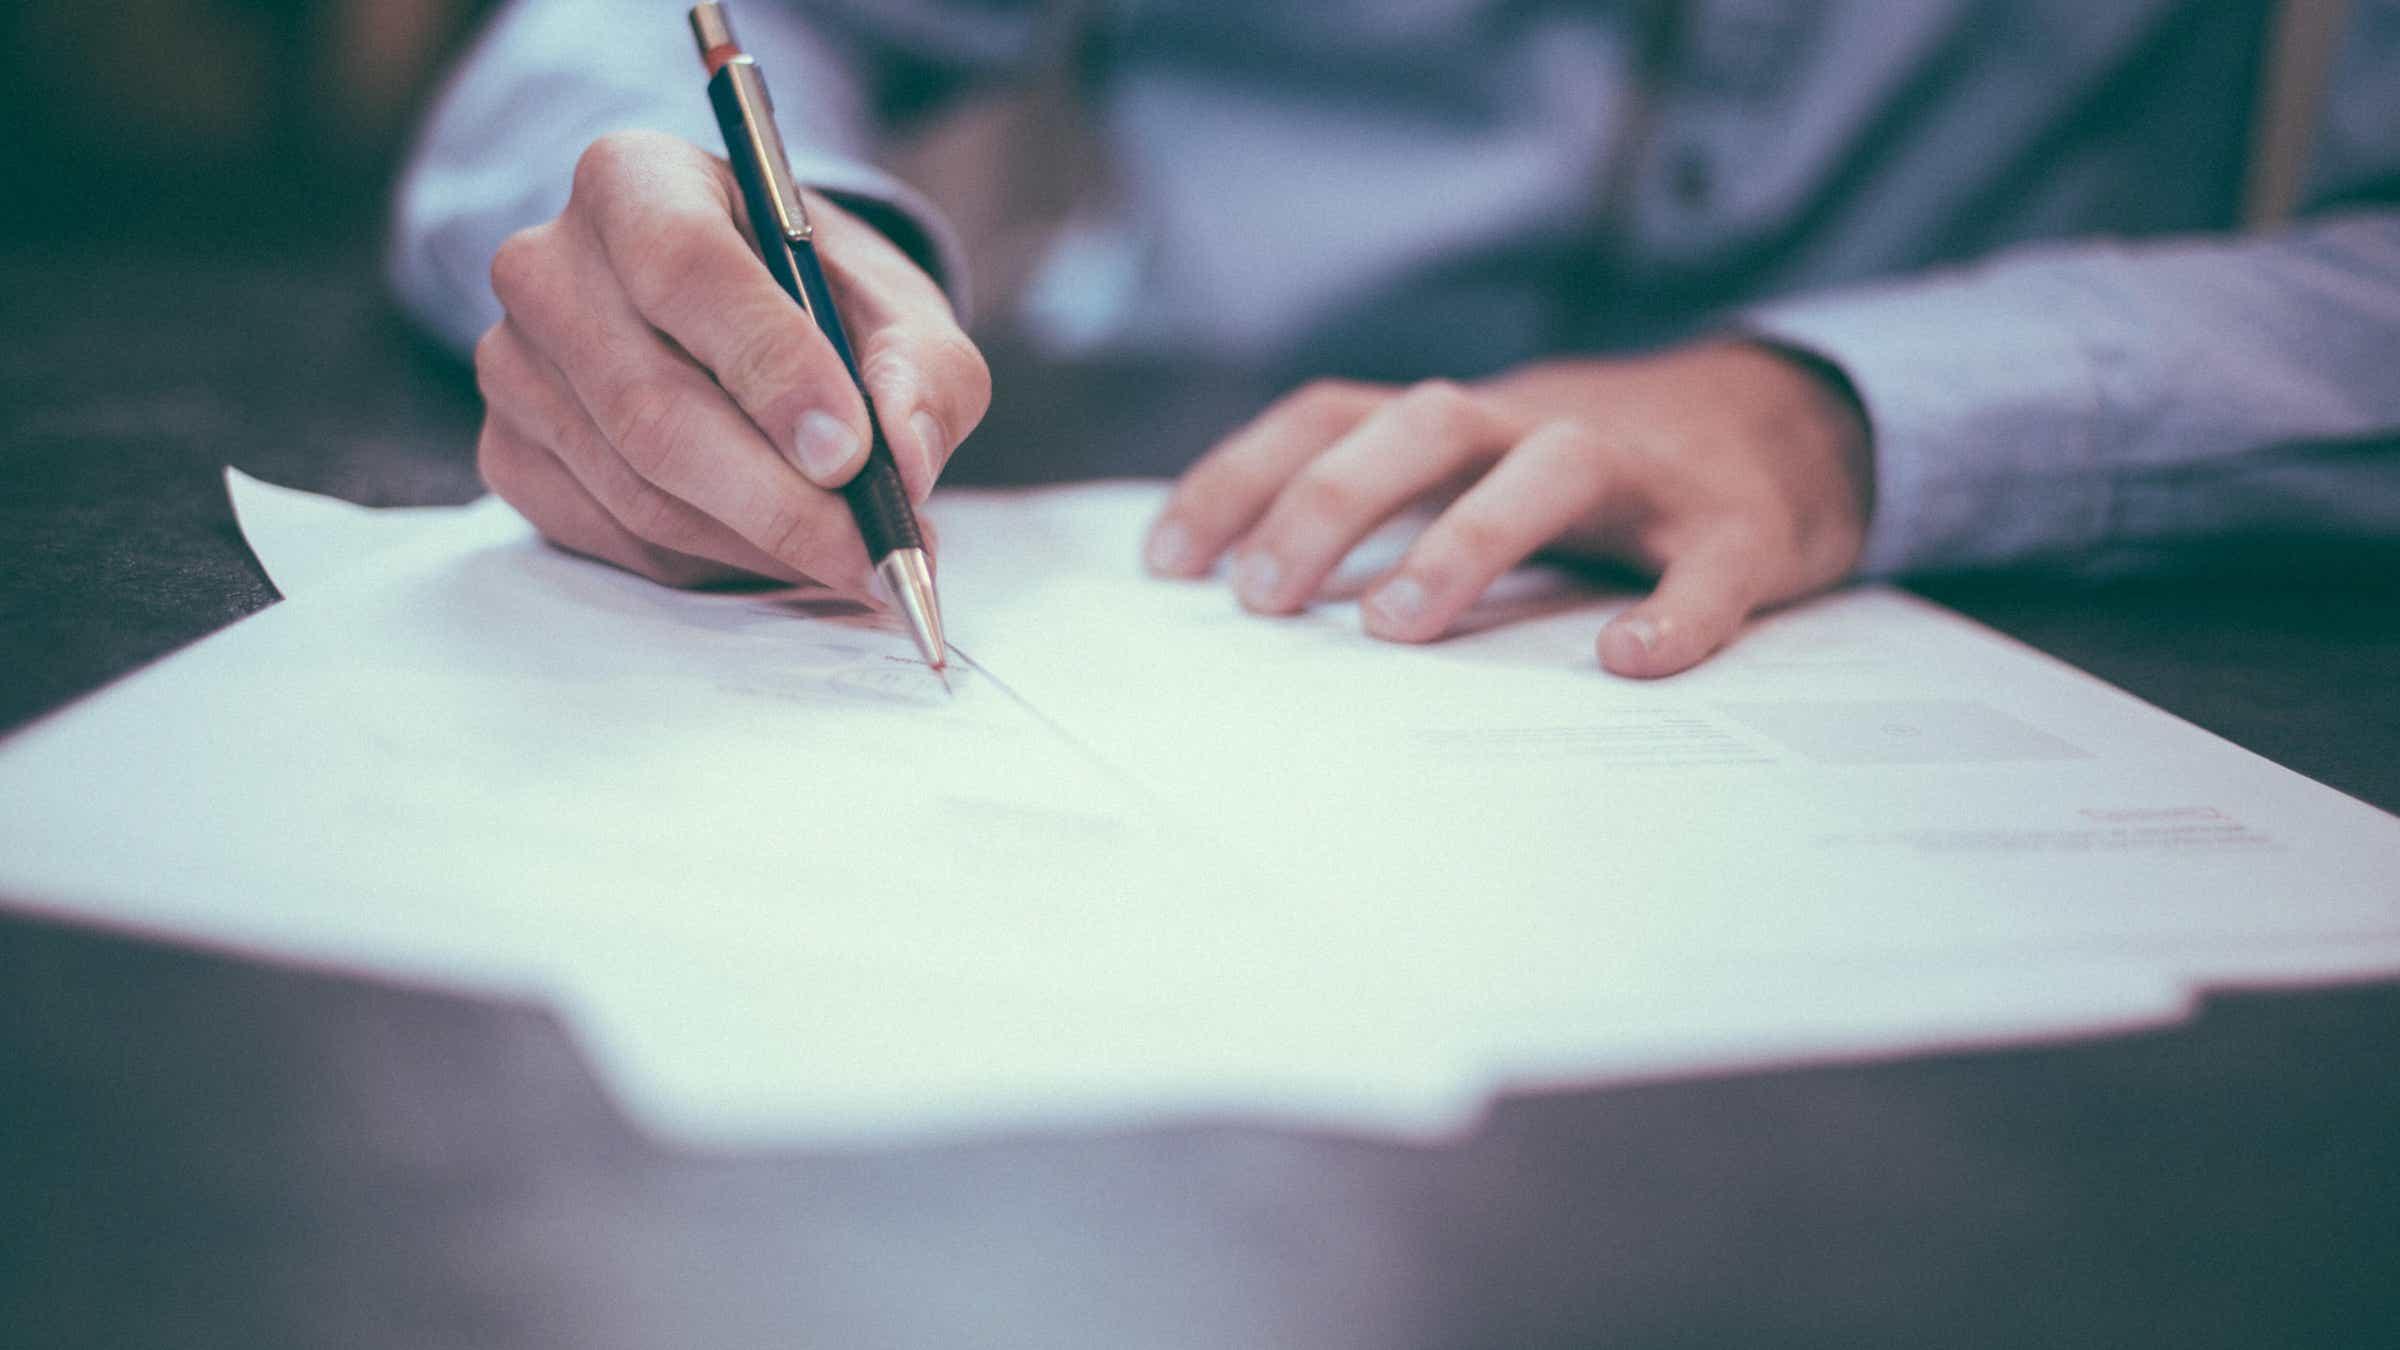 Syarat Penulisan Surat Dinas yang Benar